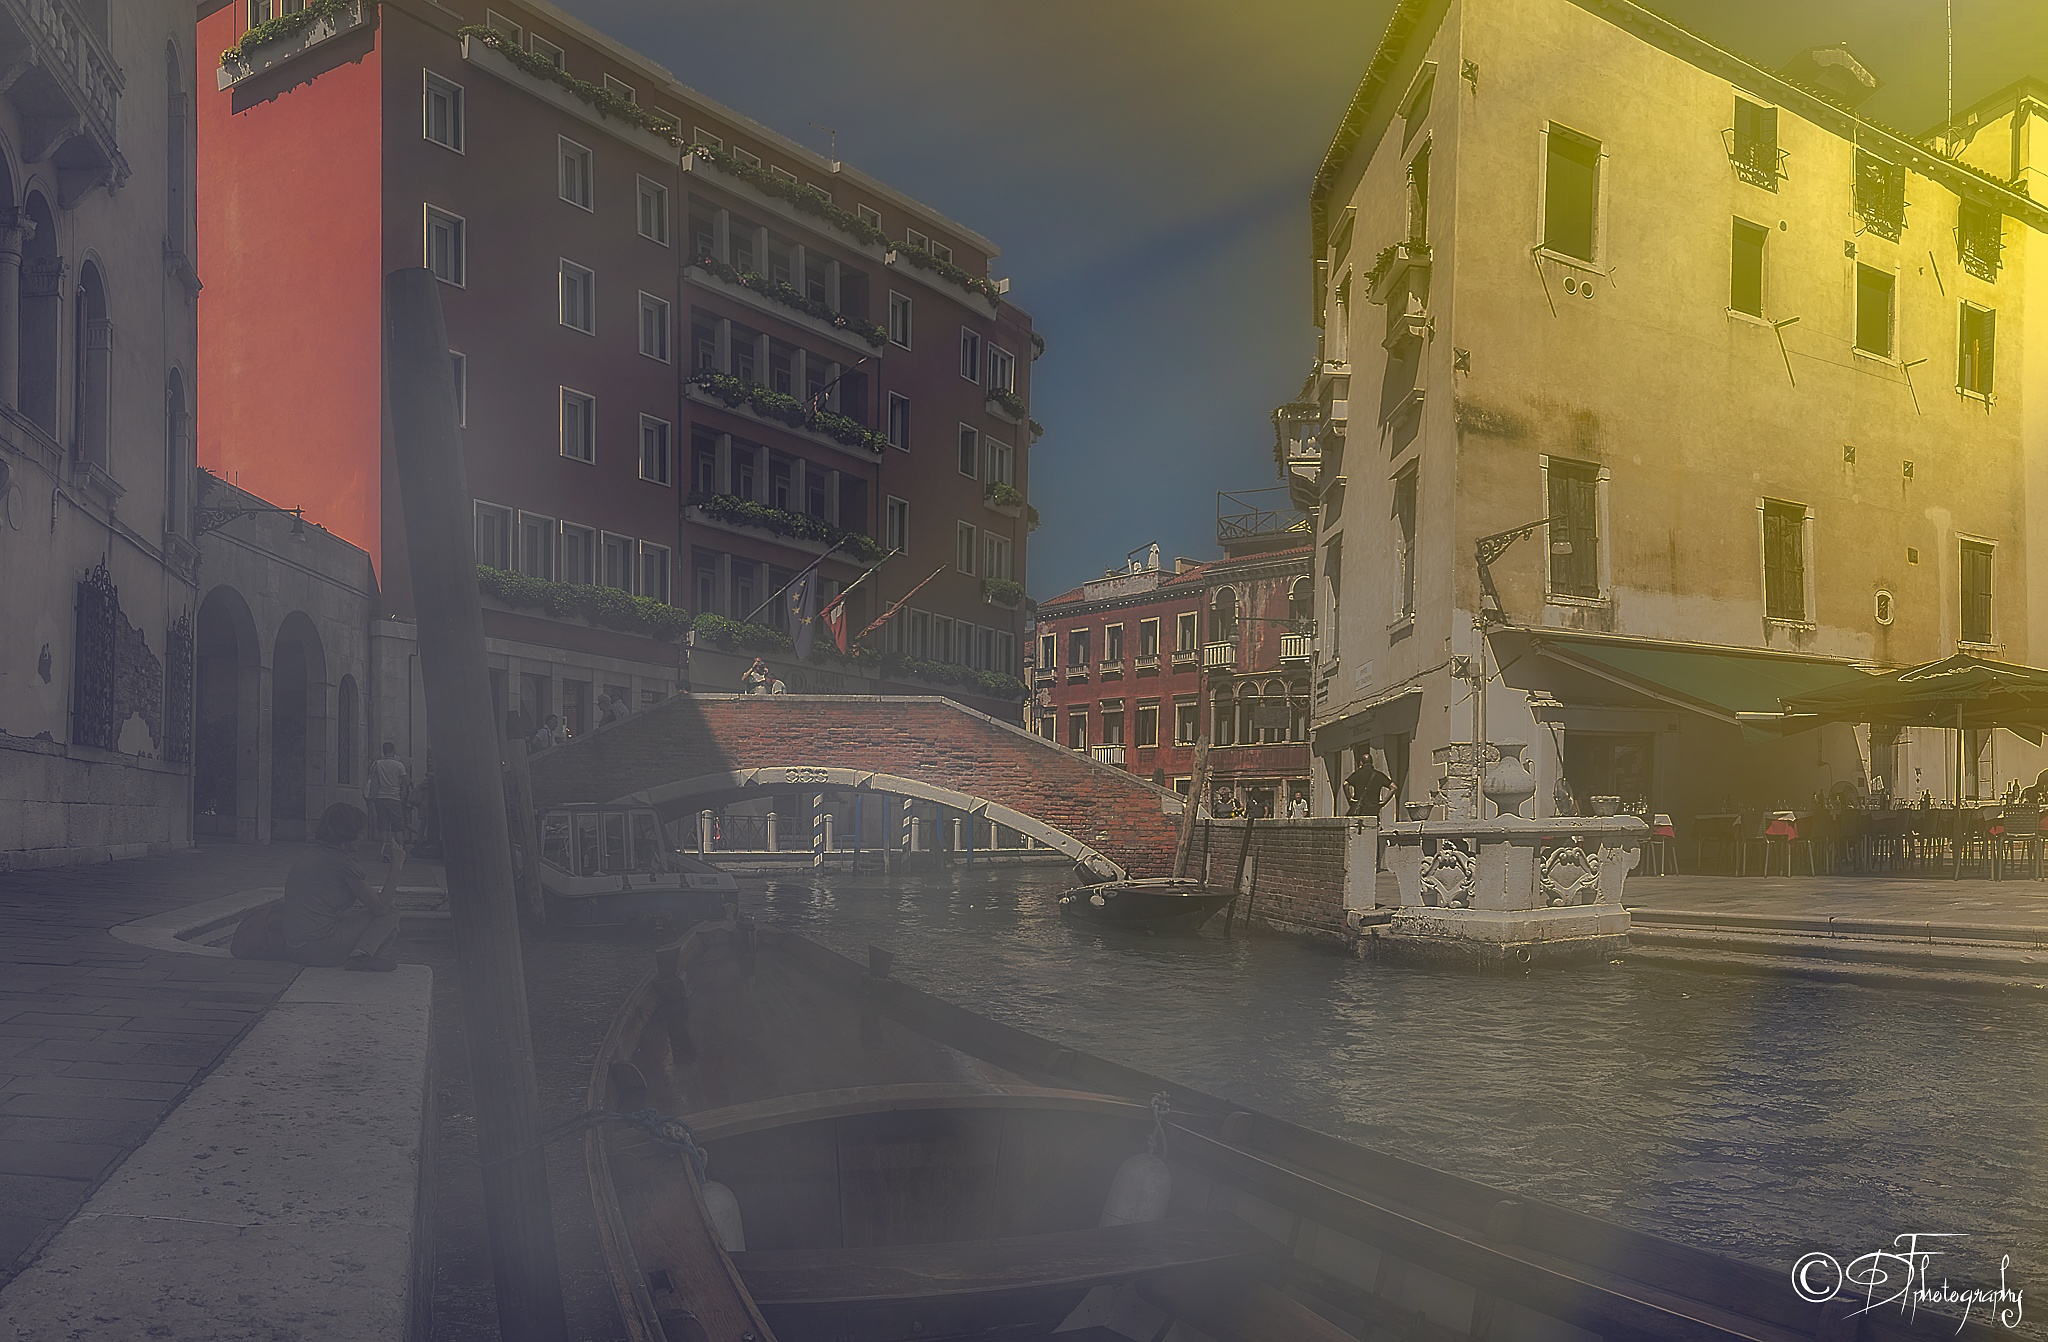 Venice canal by DANIEL F